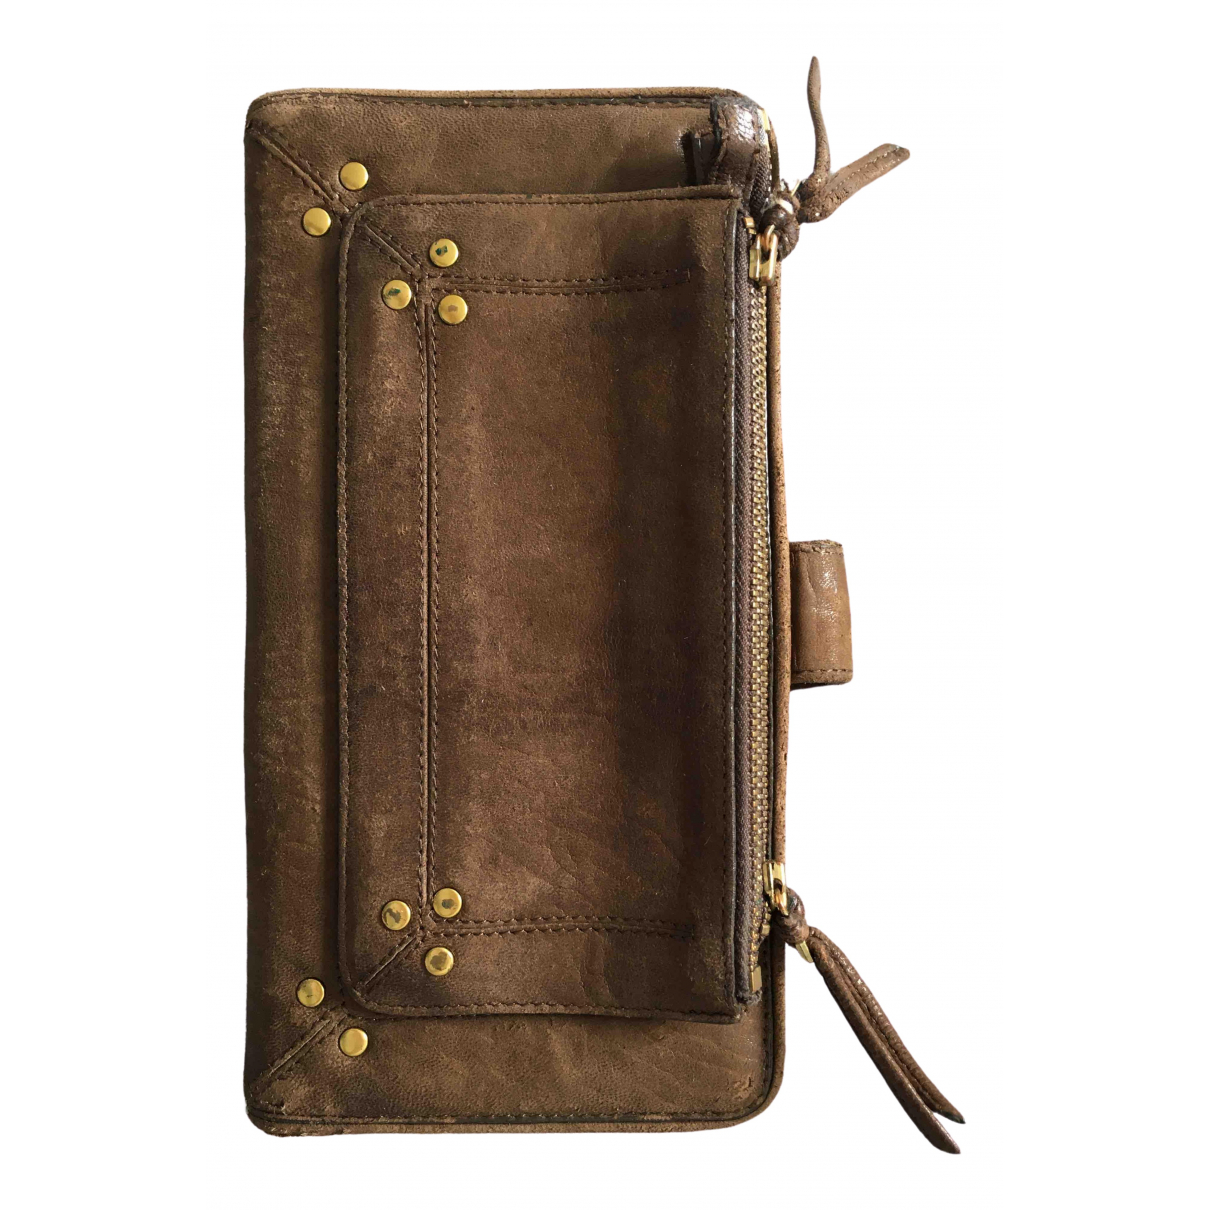 Jerome Dreyfuss \N Brown Leather wallet for Women \N